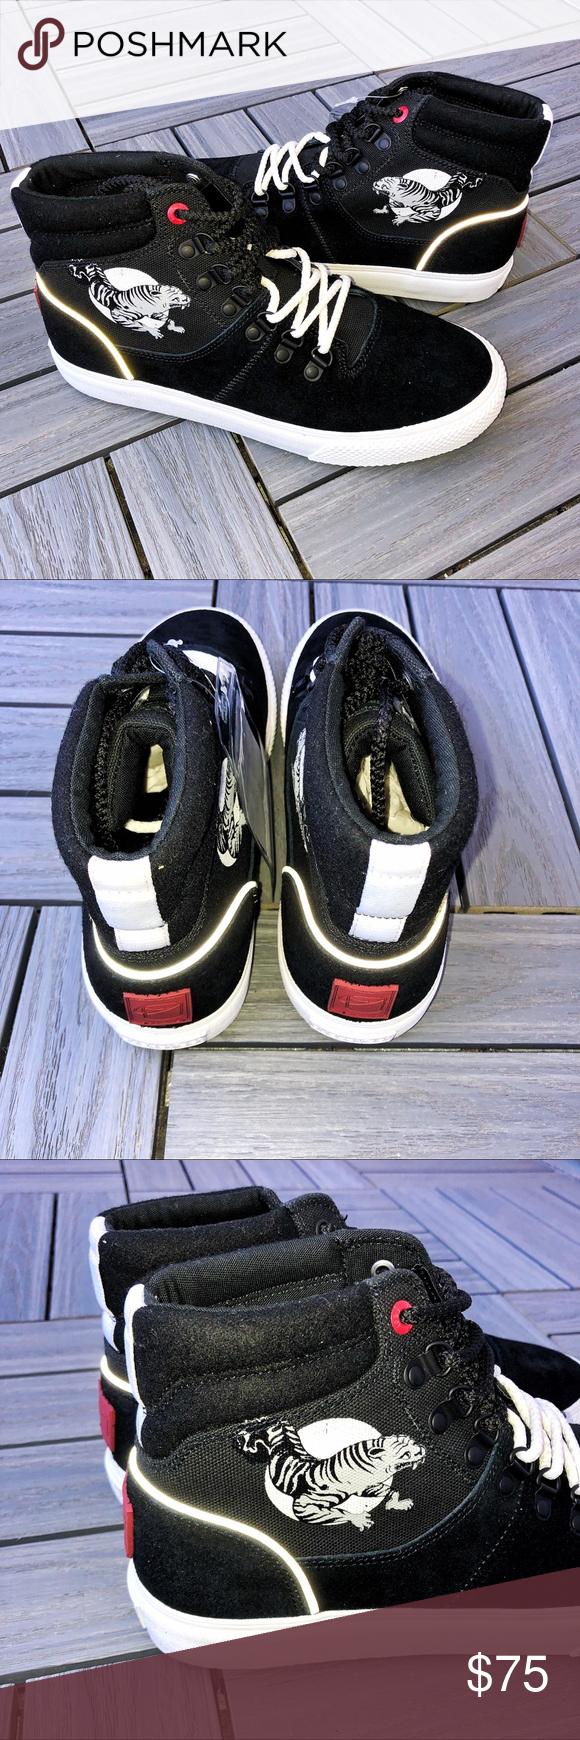 NWT - Mens Bucketfeet Tiger Sneakers